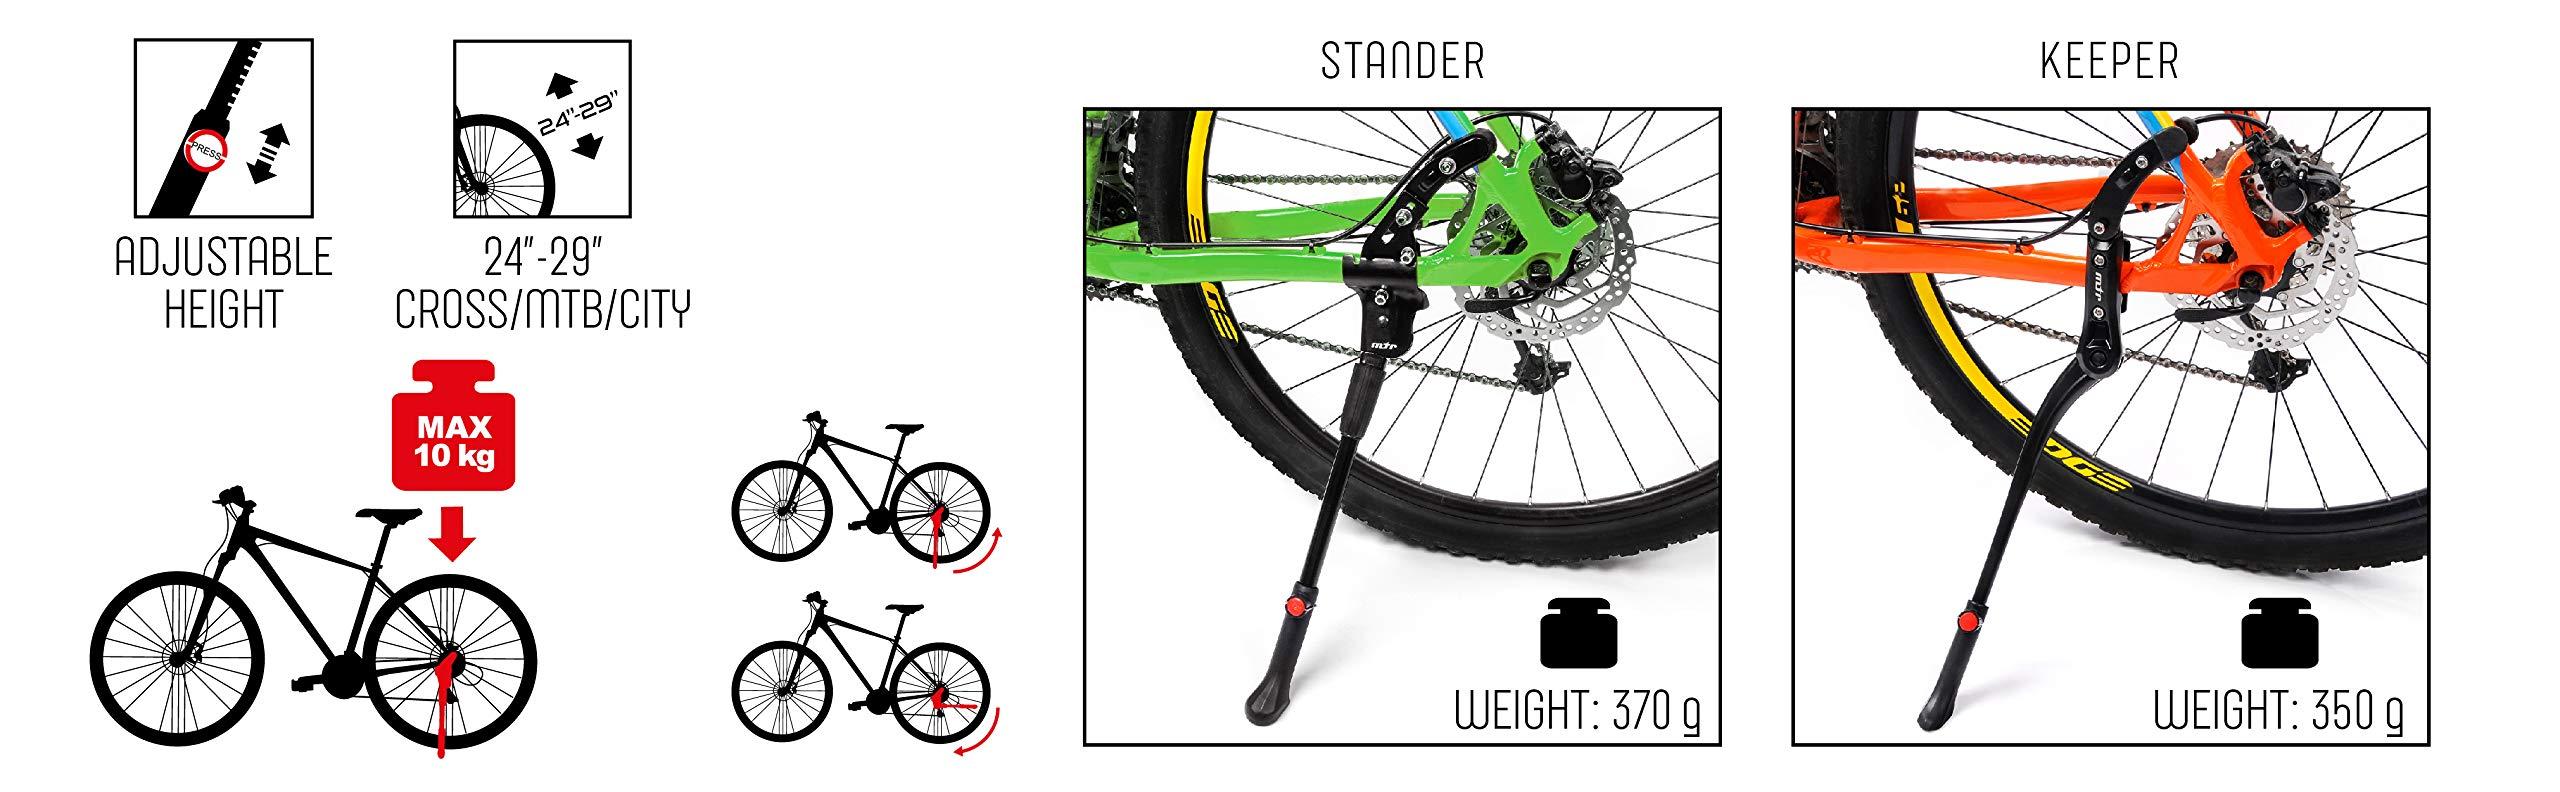 meteor Pata de Cabra para Bicicleta Aluminio Soporte Ajustable - Caballete Lateral para Bici - Soporte de Pie Universal Plegable para Ciclismo 24